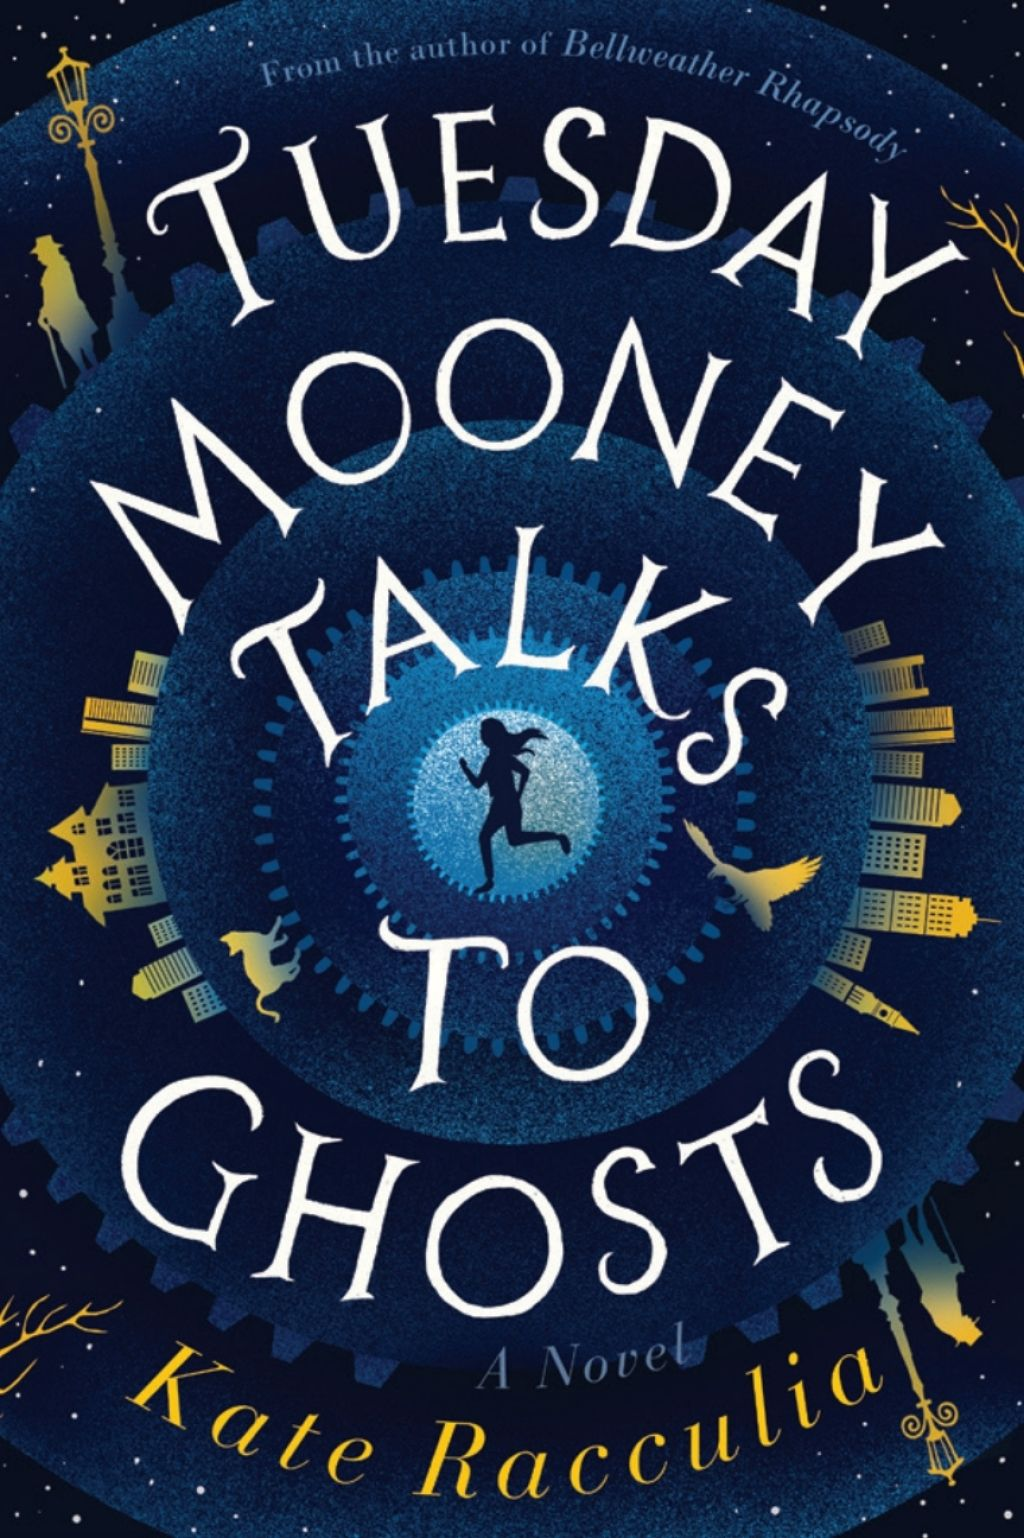 Tuesday Mooney Talks to Ghosts (eBook) Fallen book